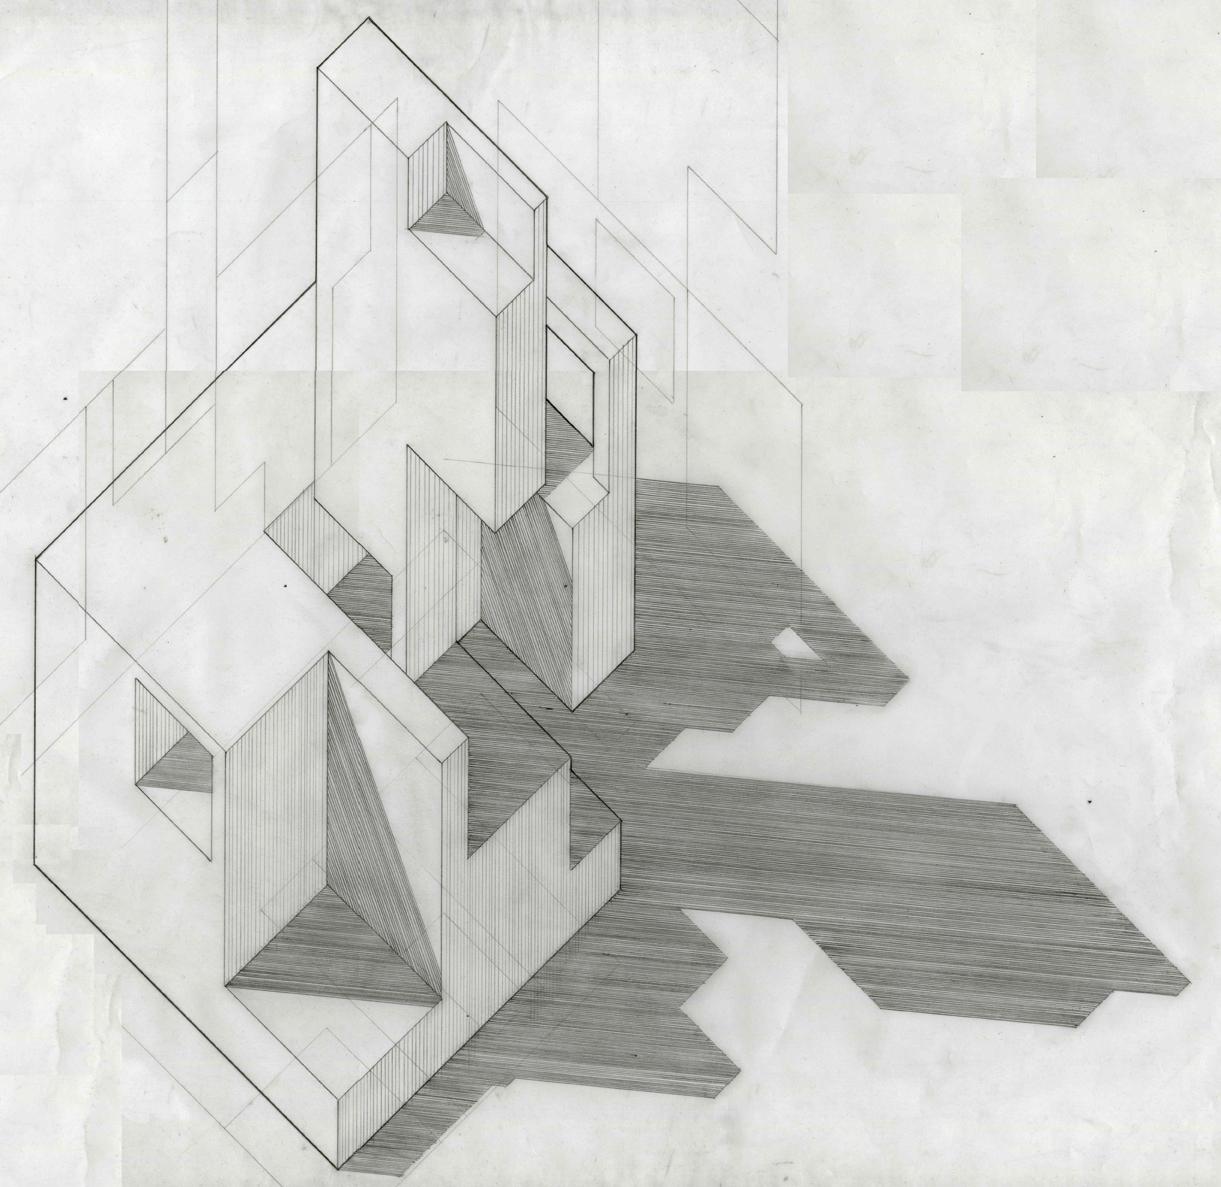 Buechs - Graphite on Vellum.jpg